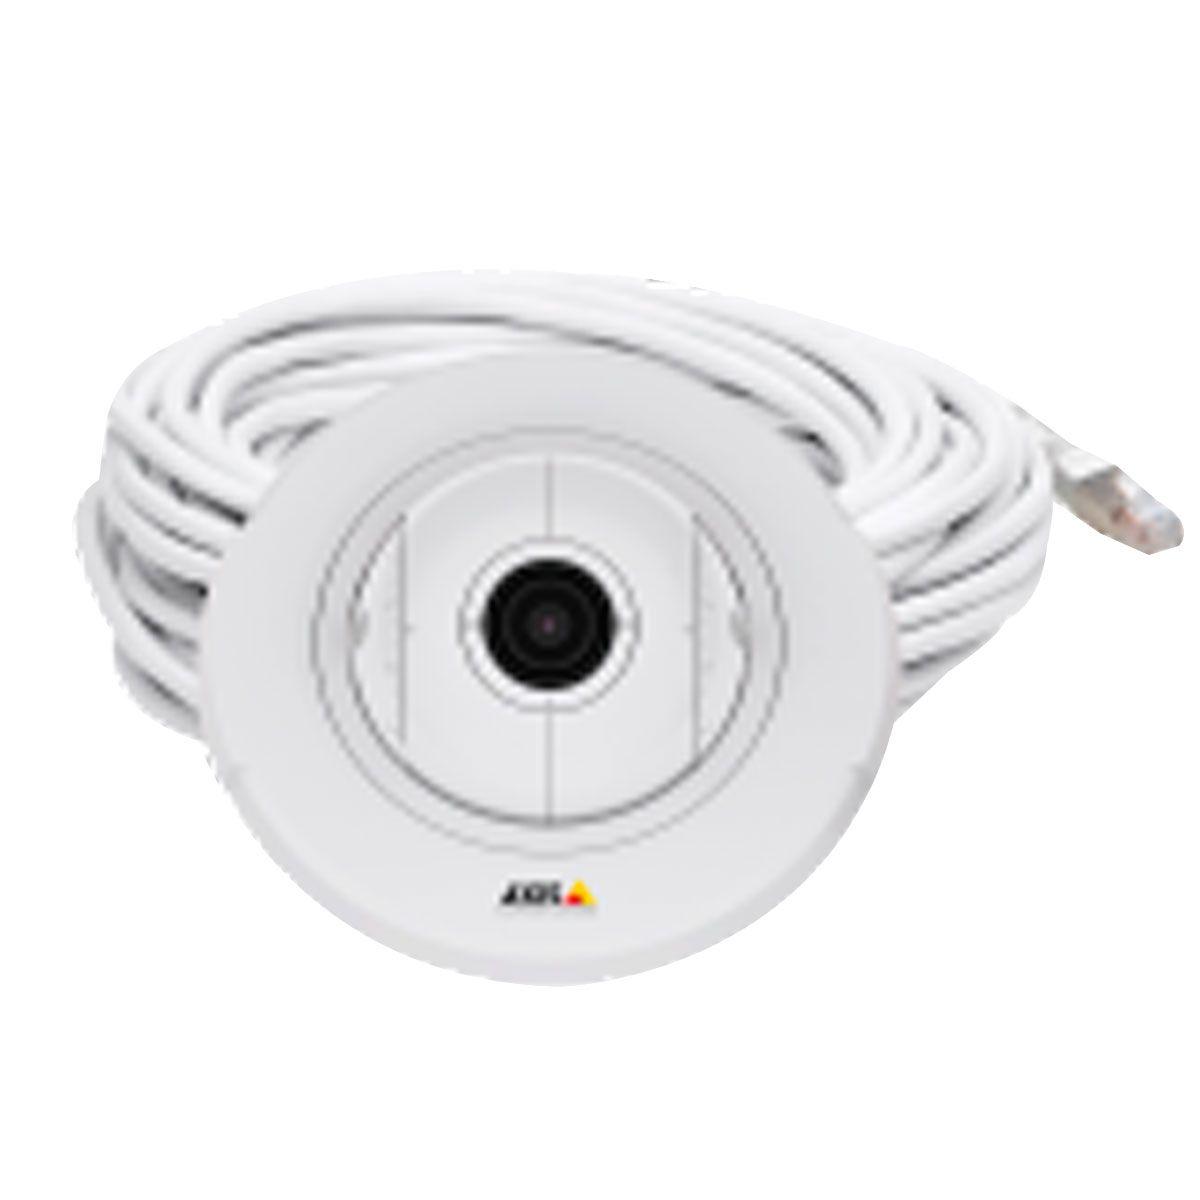 Unidad de sensor domo Axis F4005-E